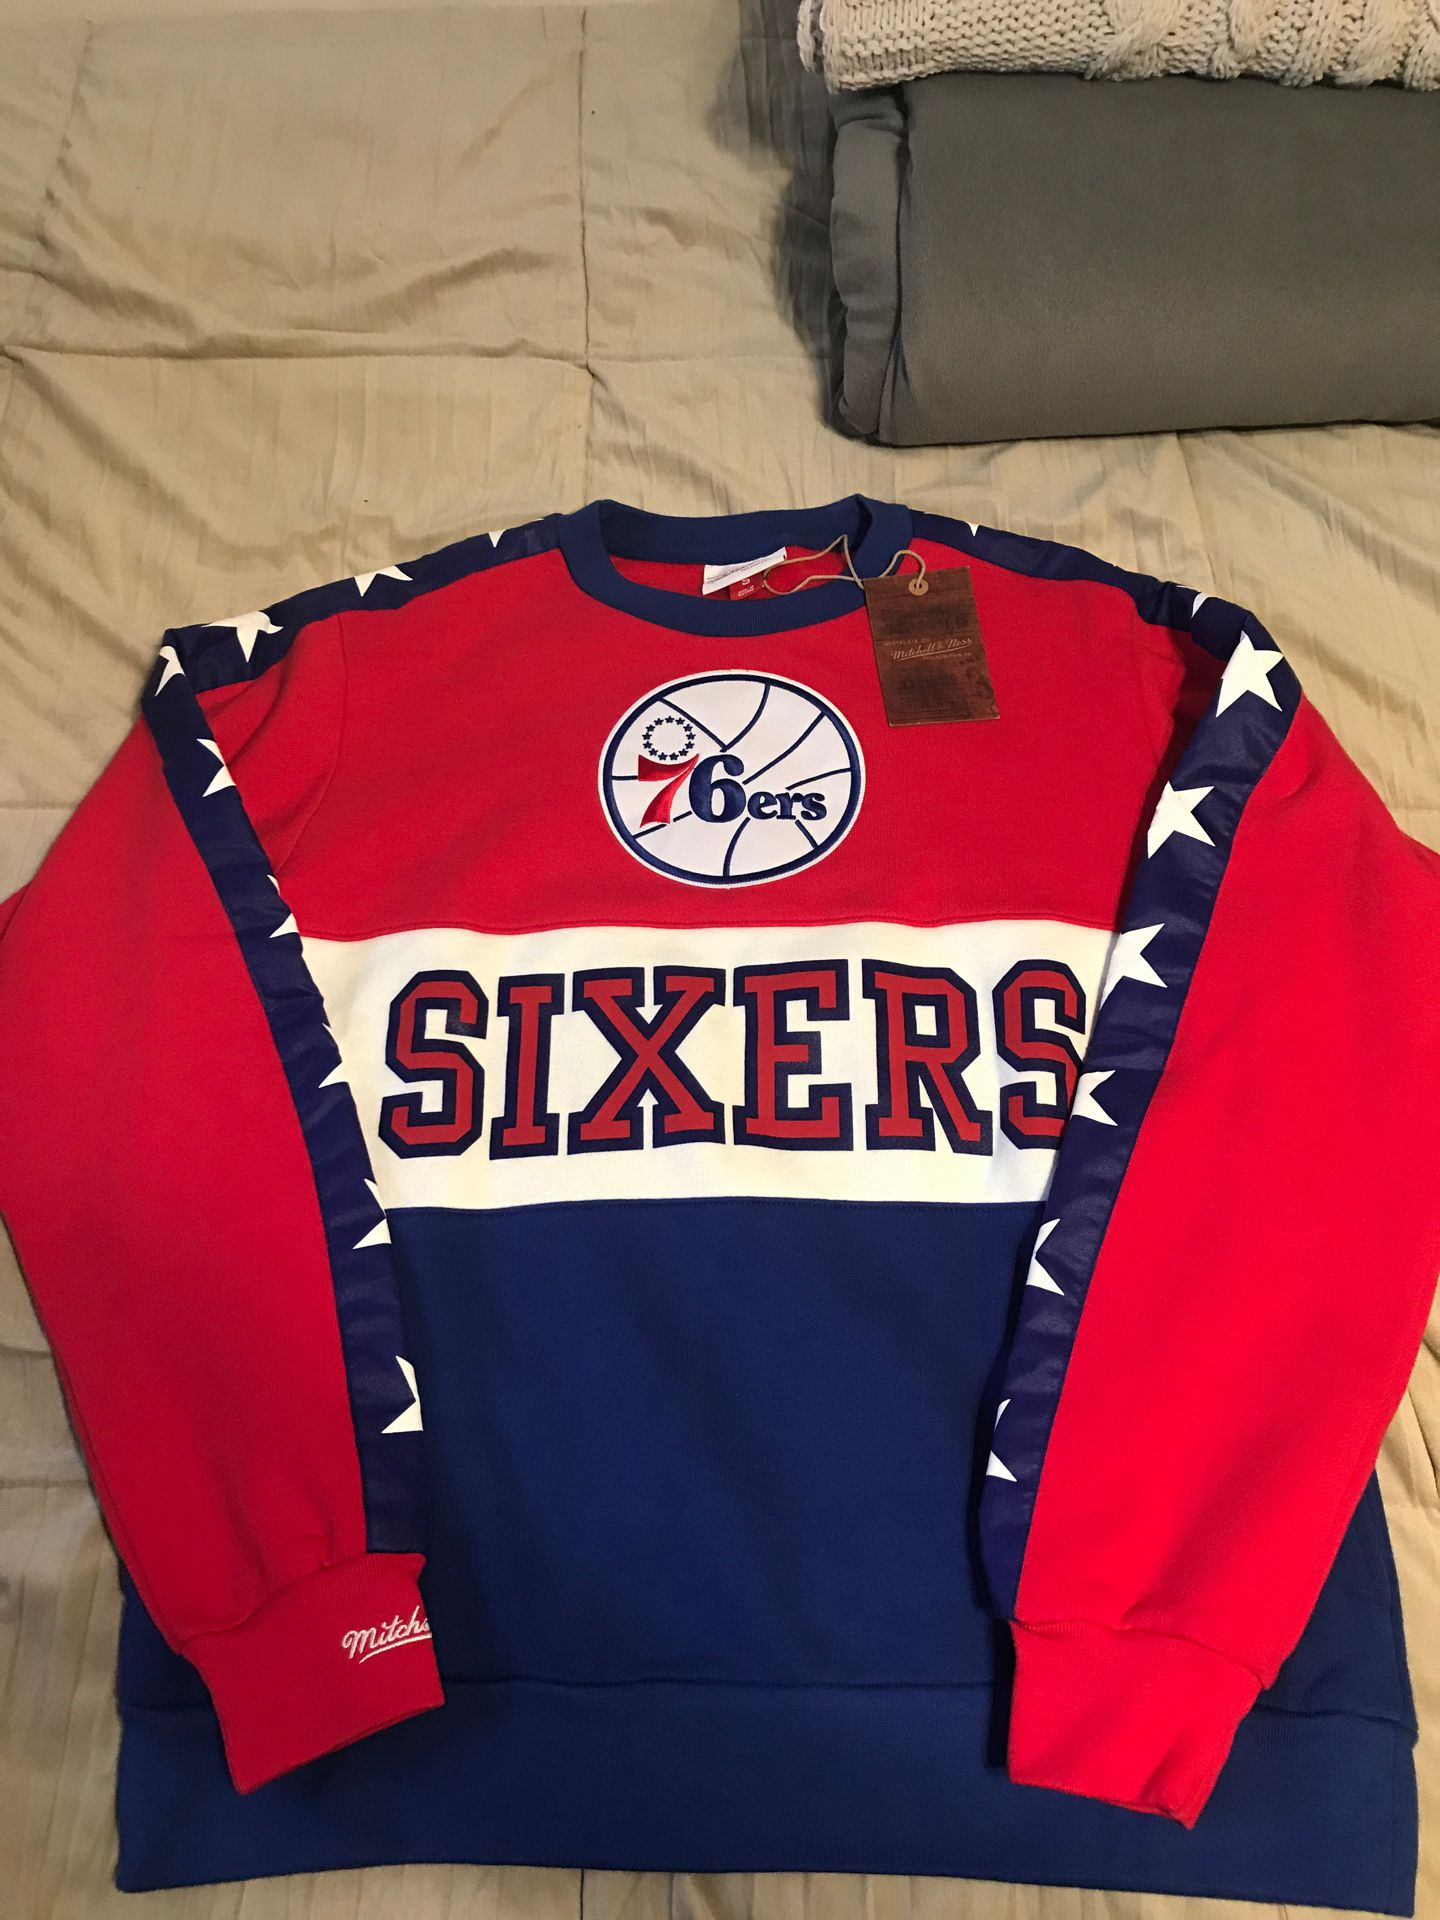 76ers Crew Neck Pull Over 'Sixers' NBA Philadelphia 76ers